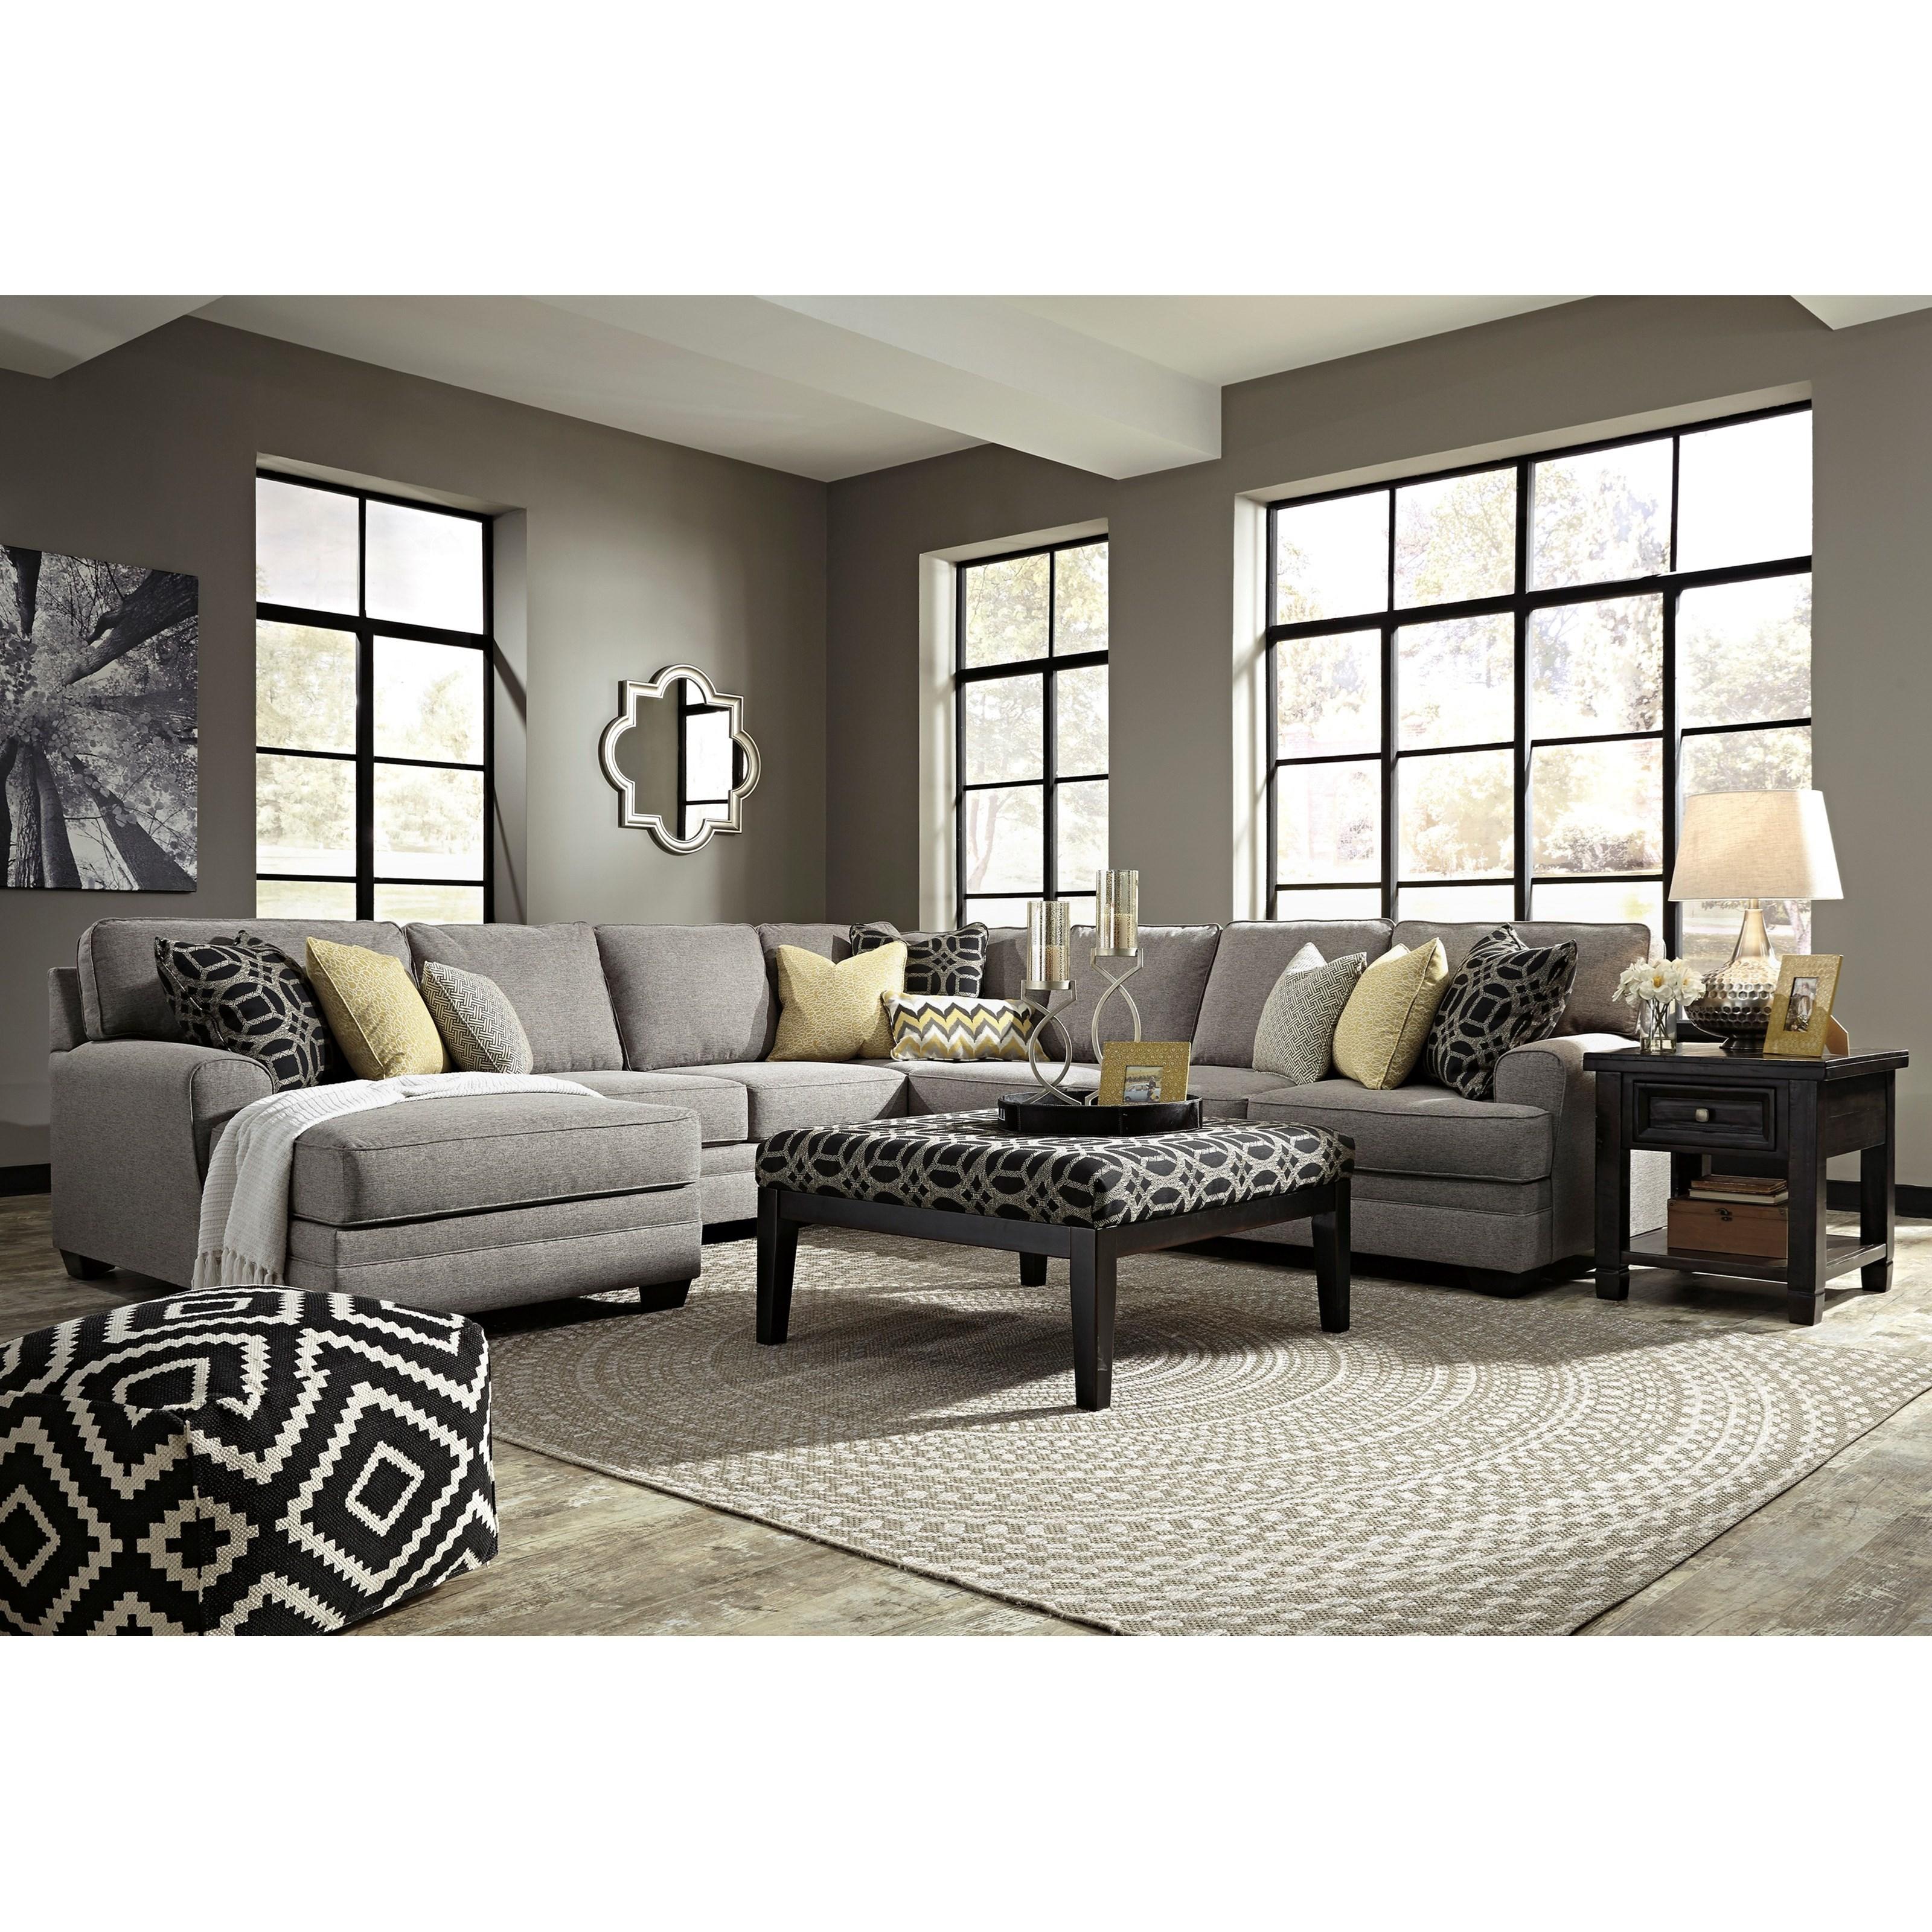 Ashley/Benchcraft Cresson Stationary Living Room Group - Item Number: 54907 Living Room Group 5